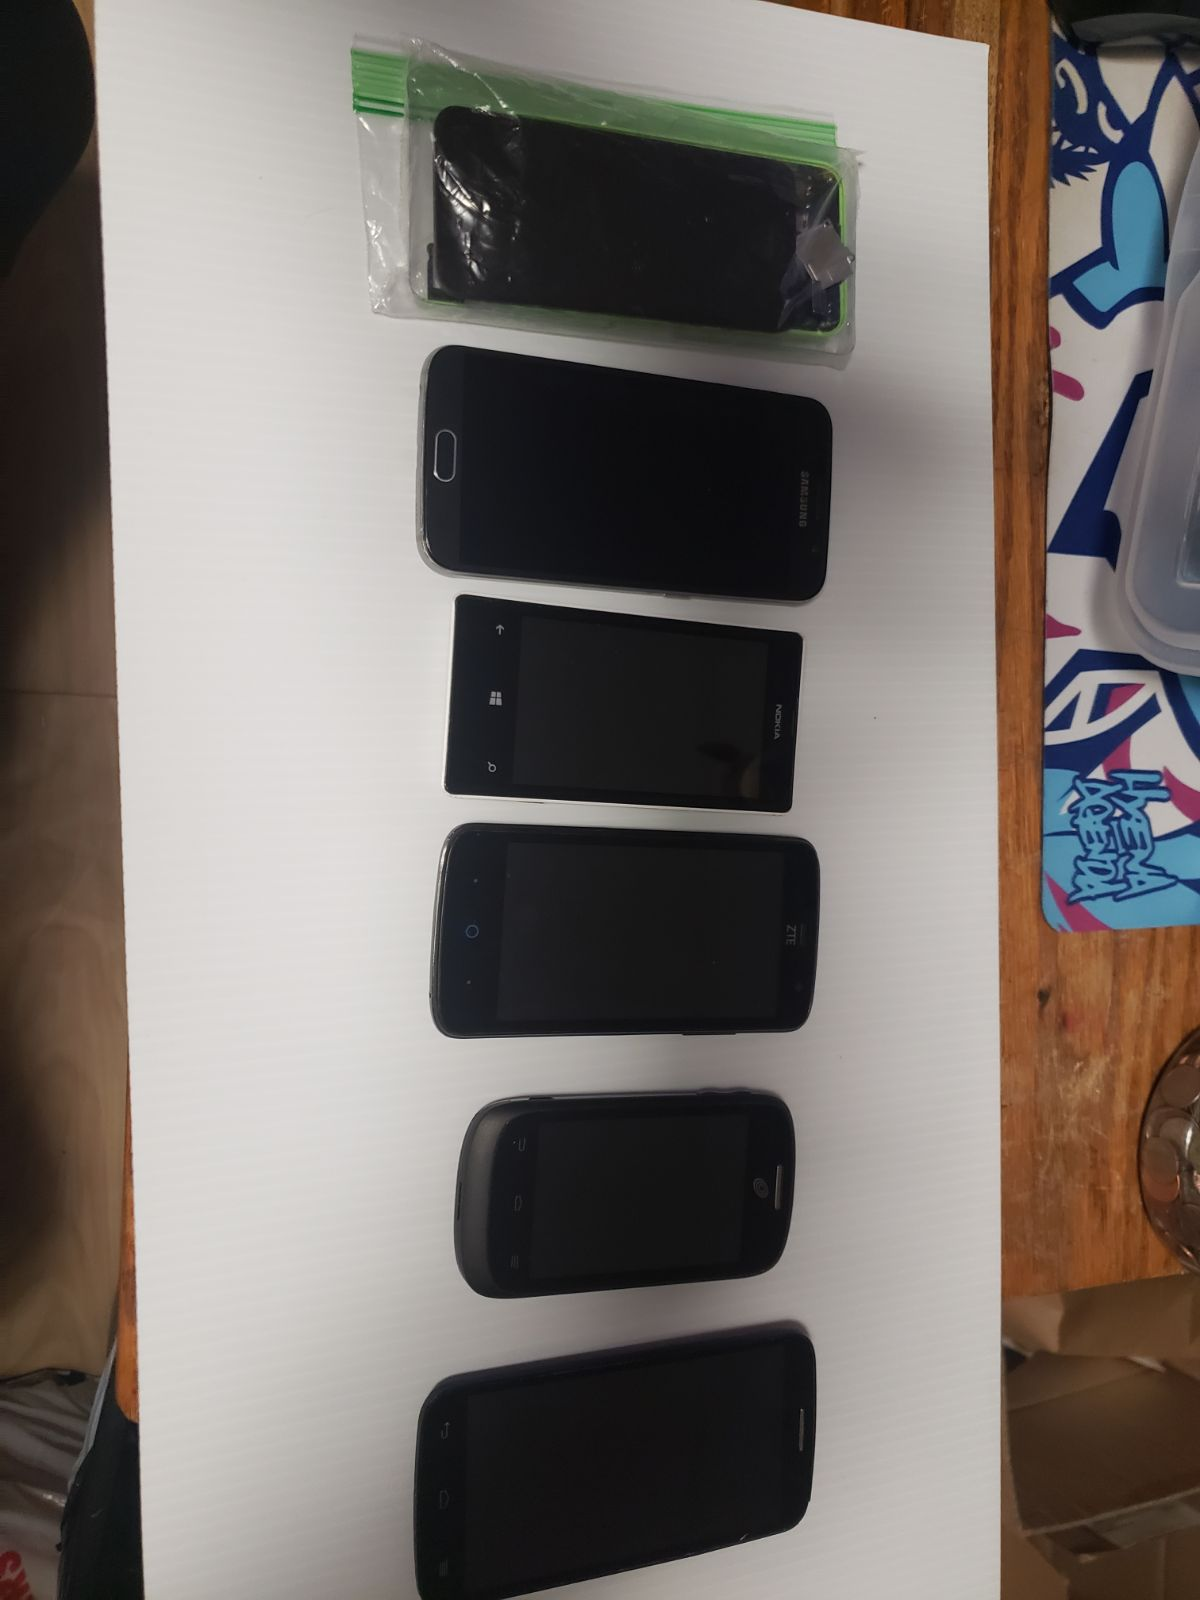 Smart Phone Lot - 6 Phones